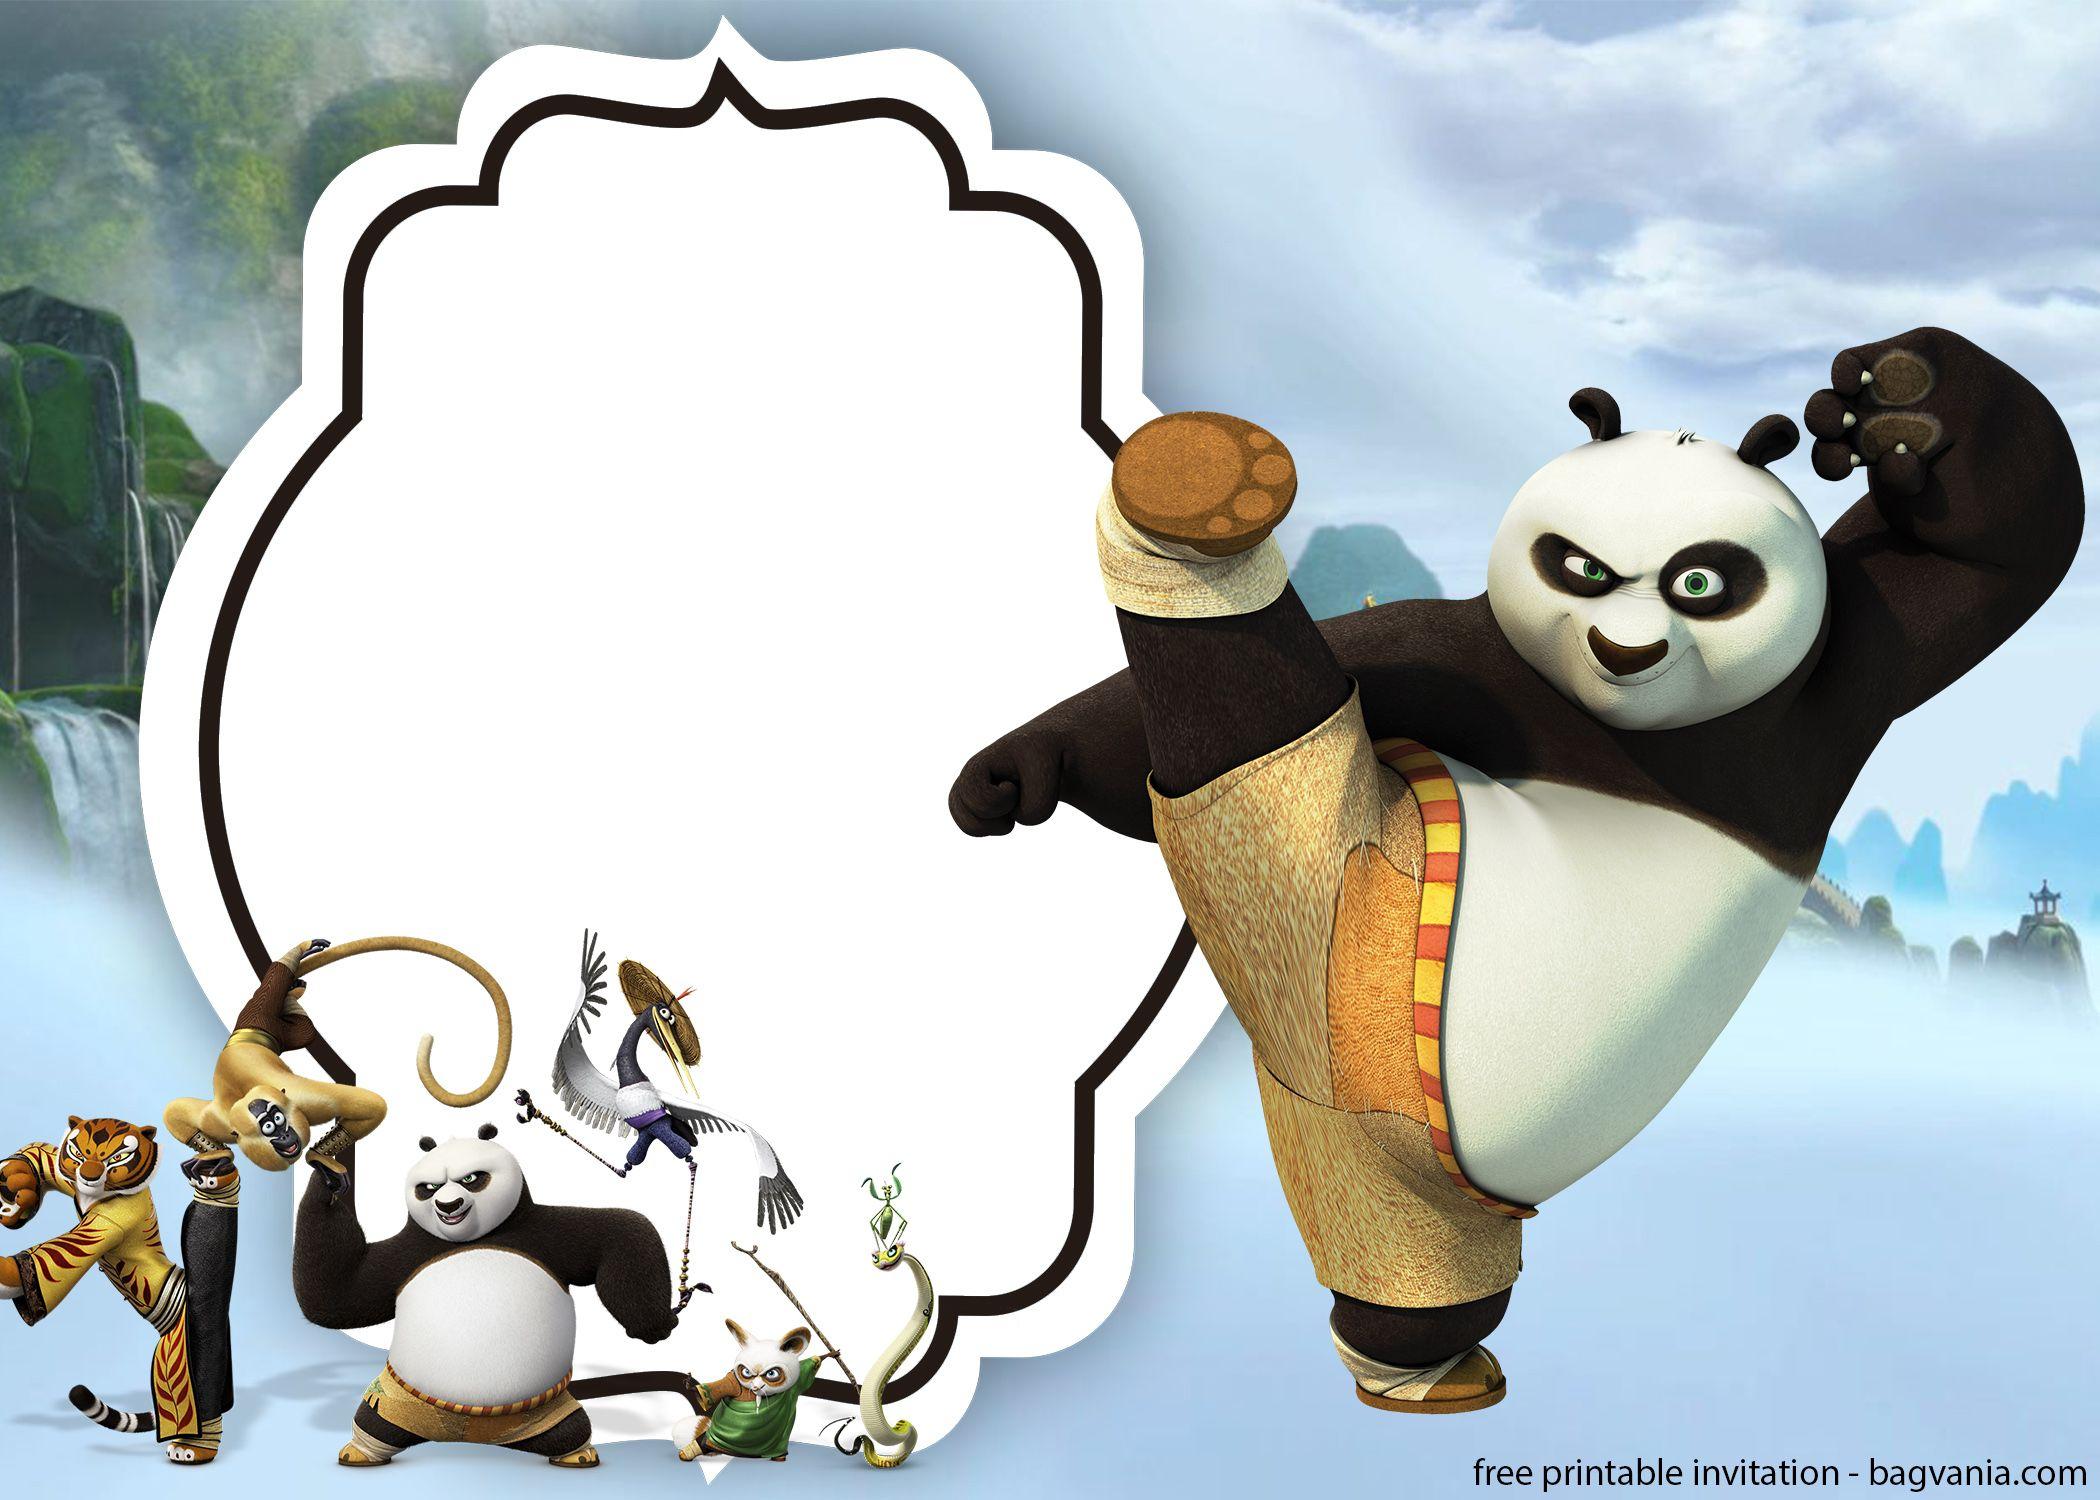 Free Kungfu Panda Invitations Templates | Bagvania Invitation | Free - Panda Bear Invitations Free Printable